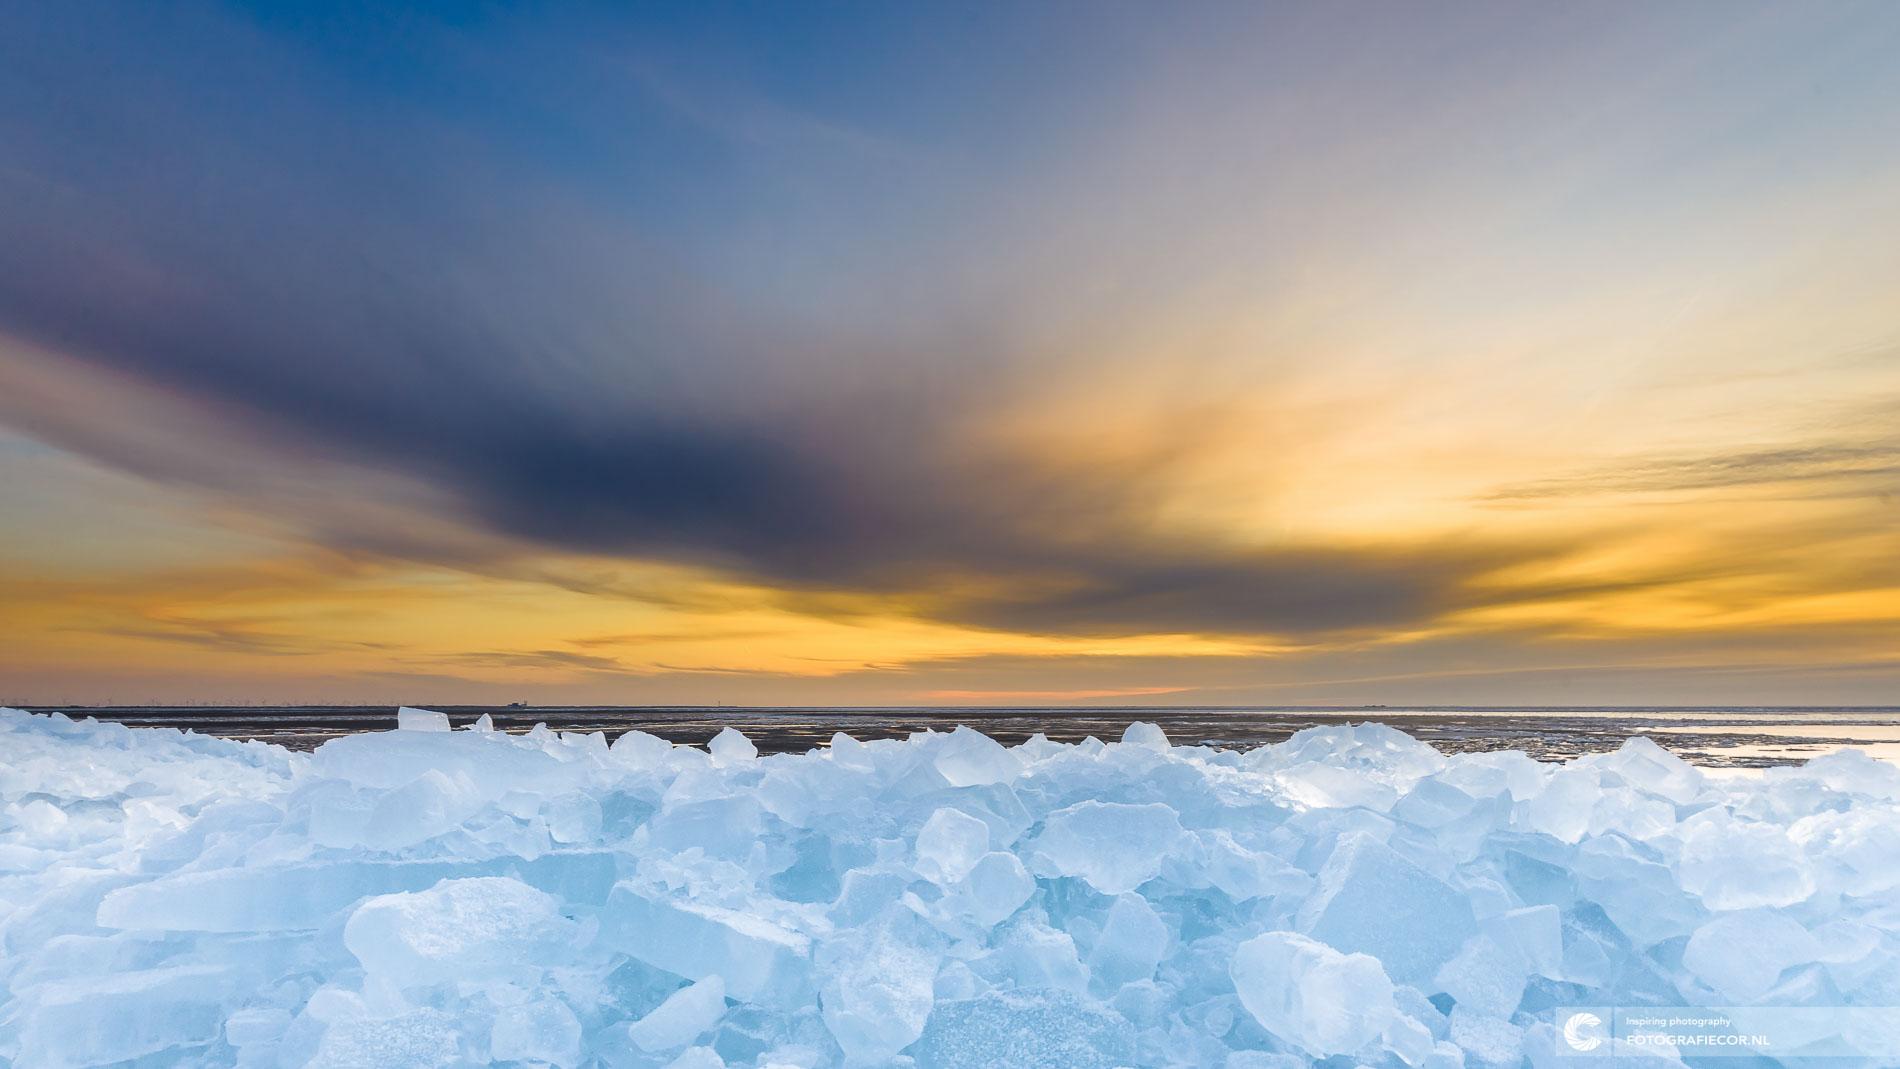 kruiend ijs IJsselmeer, Urk, Holland | Landschapsfotograaf